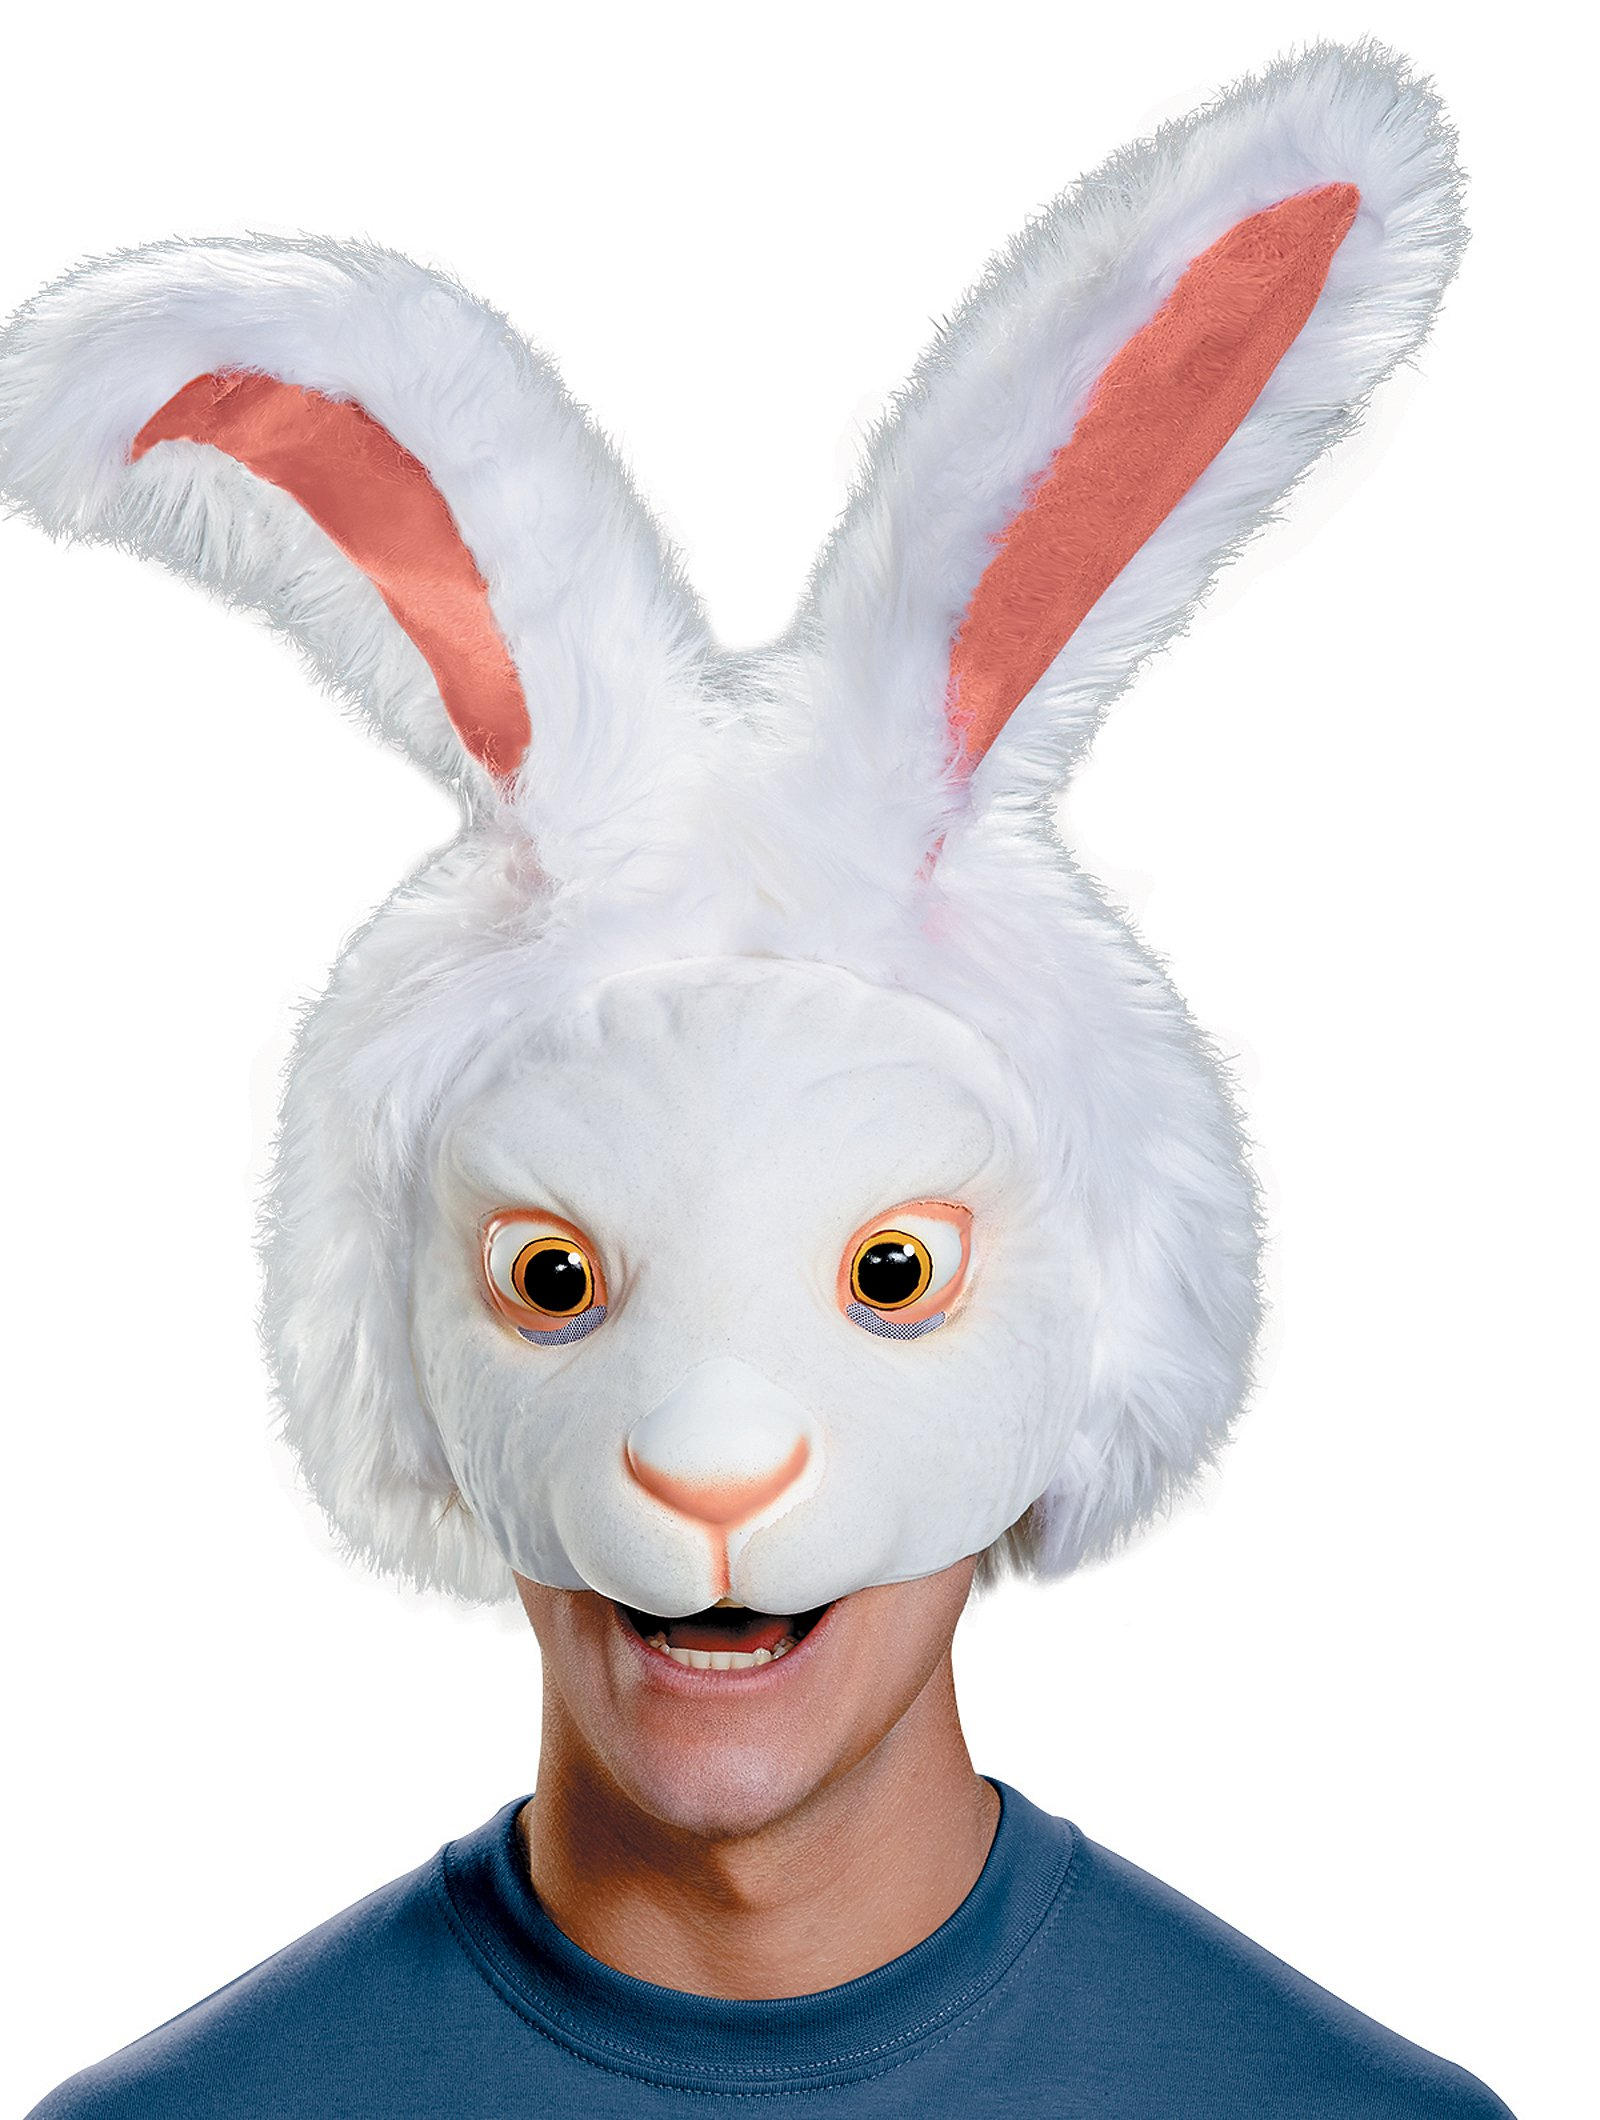 White Rabbit Headpiece Costume Mask